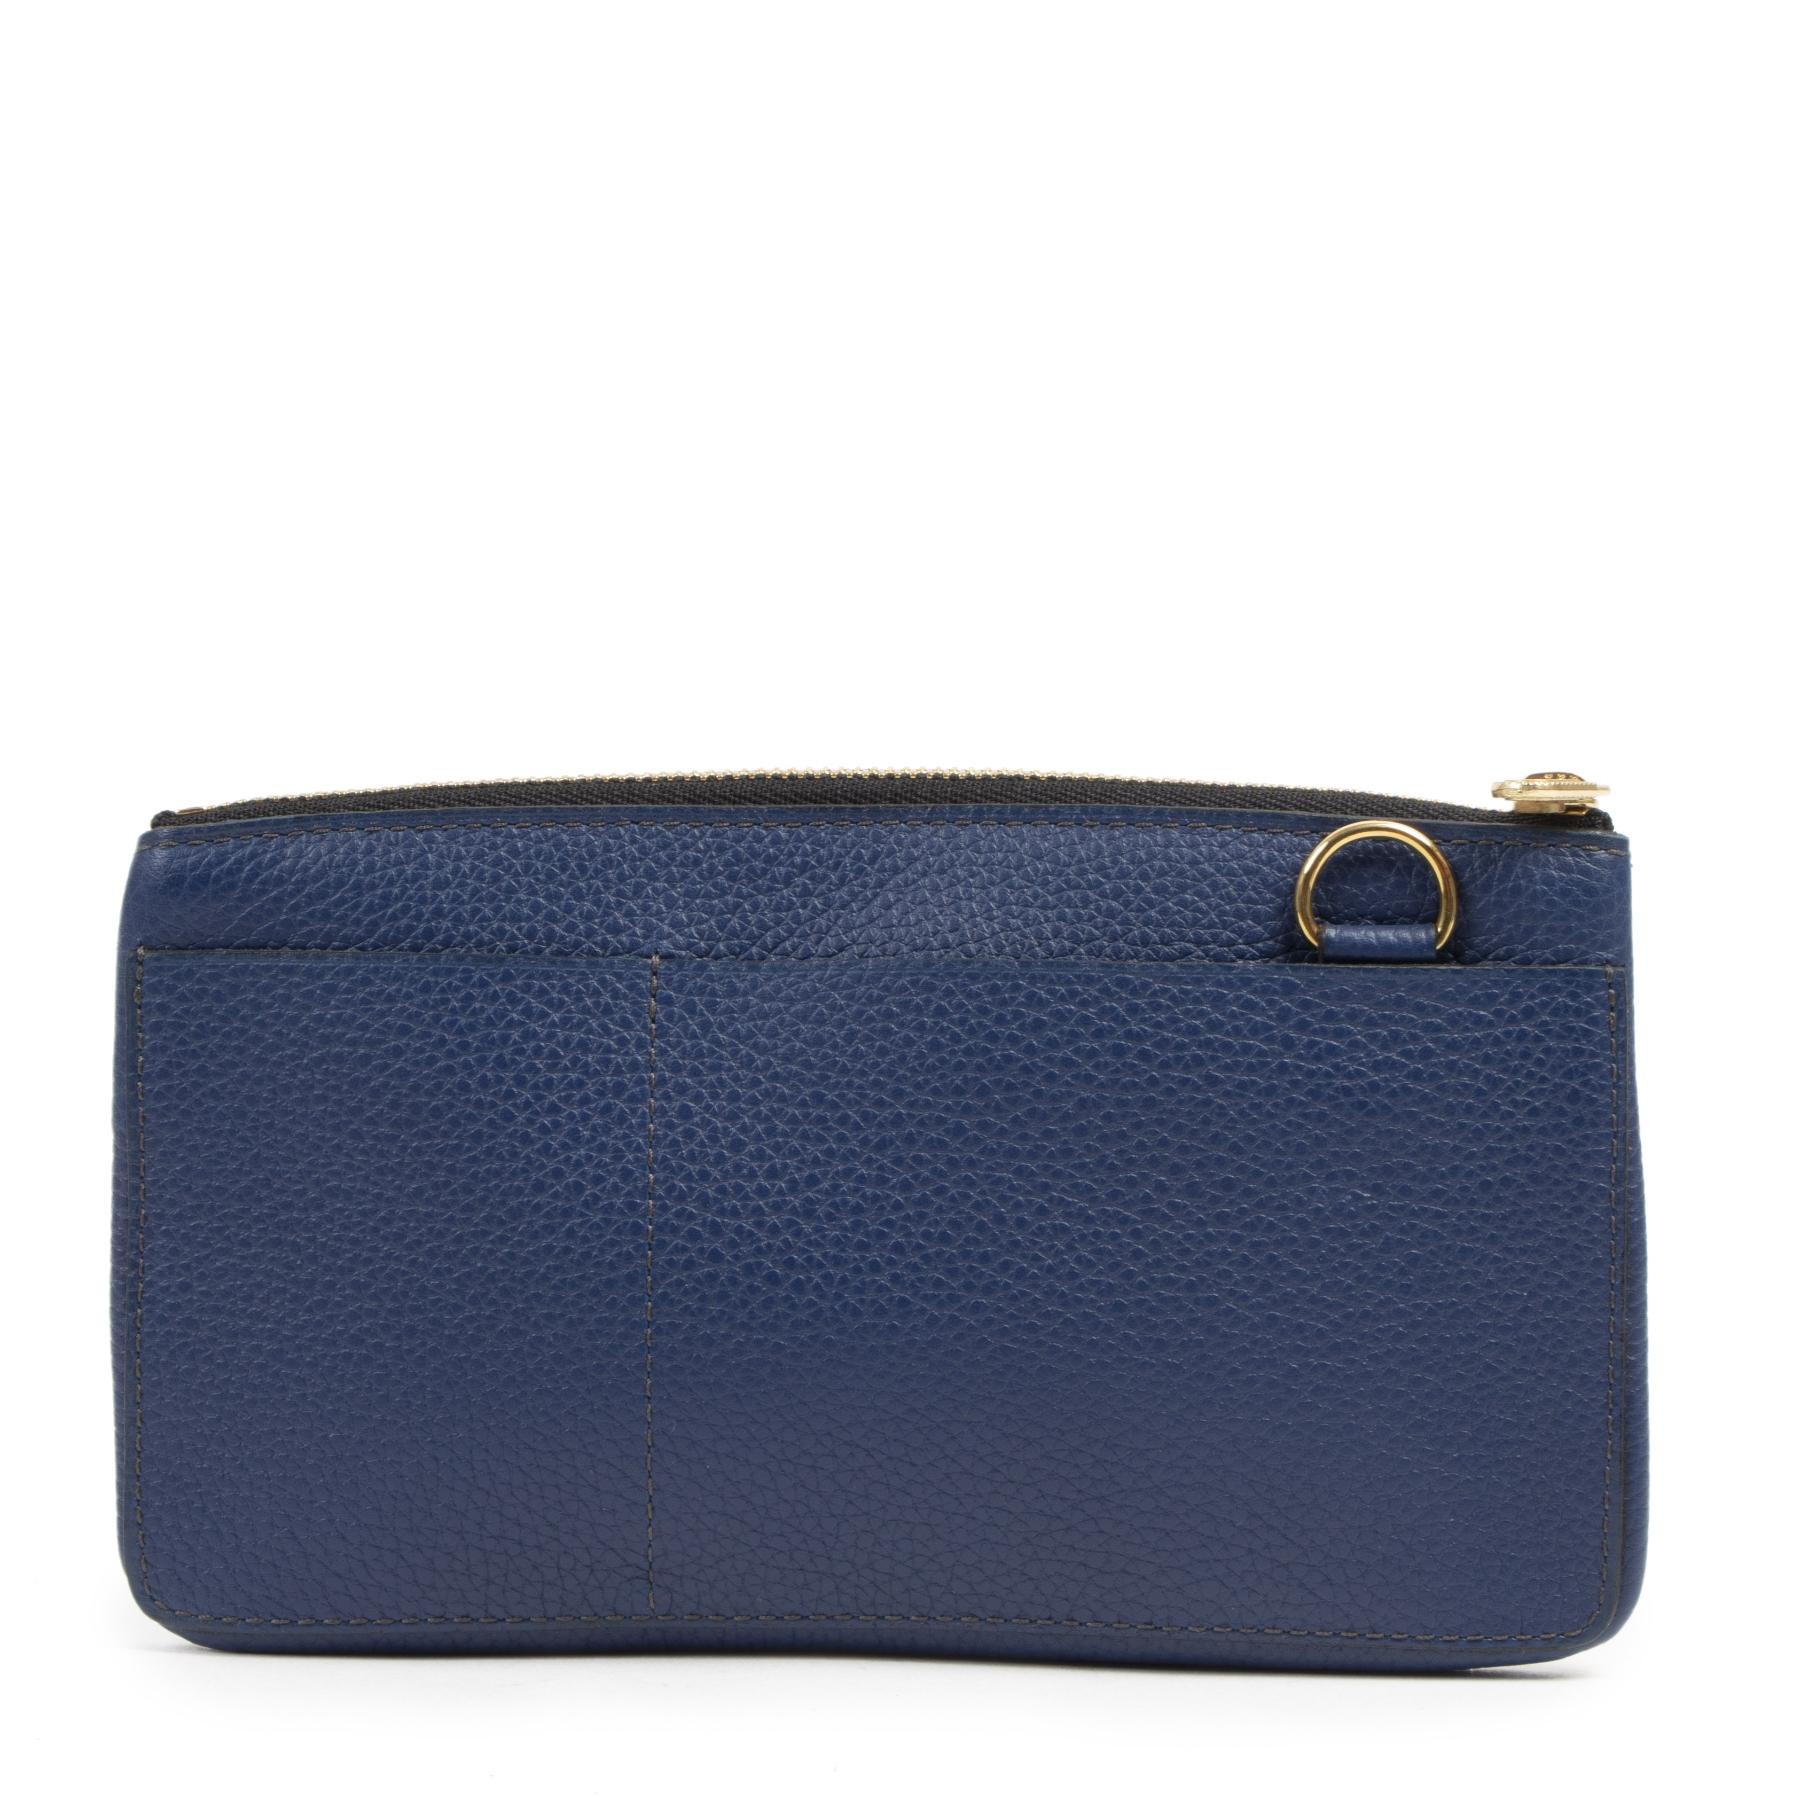 Authentieke tweedehands vintage Delvaux Blue Leather Pouch koop online webshop LabelLOV